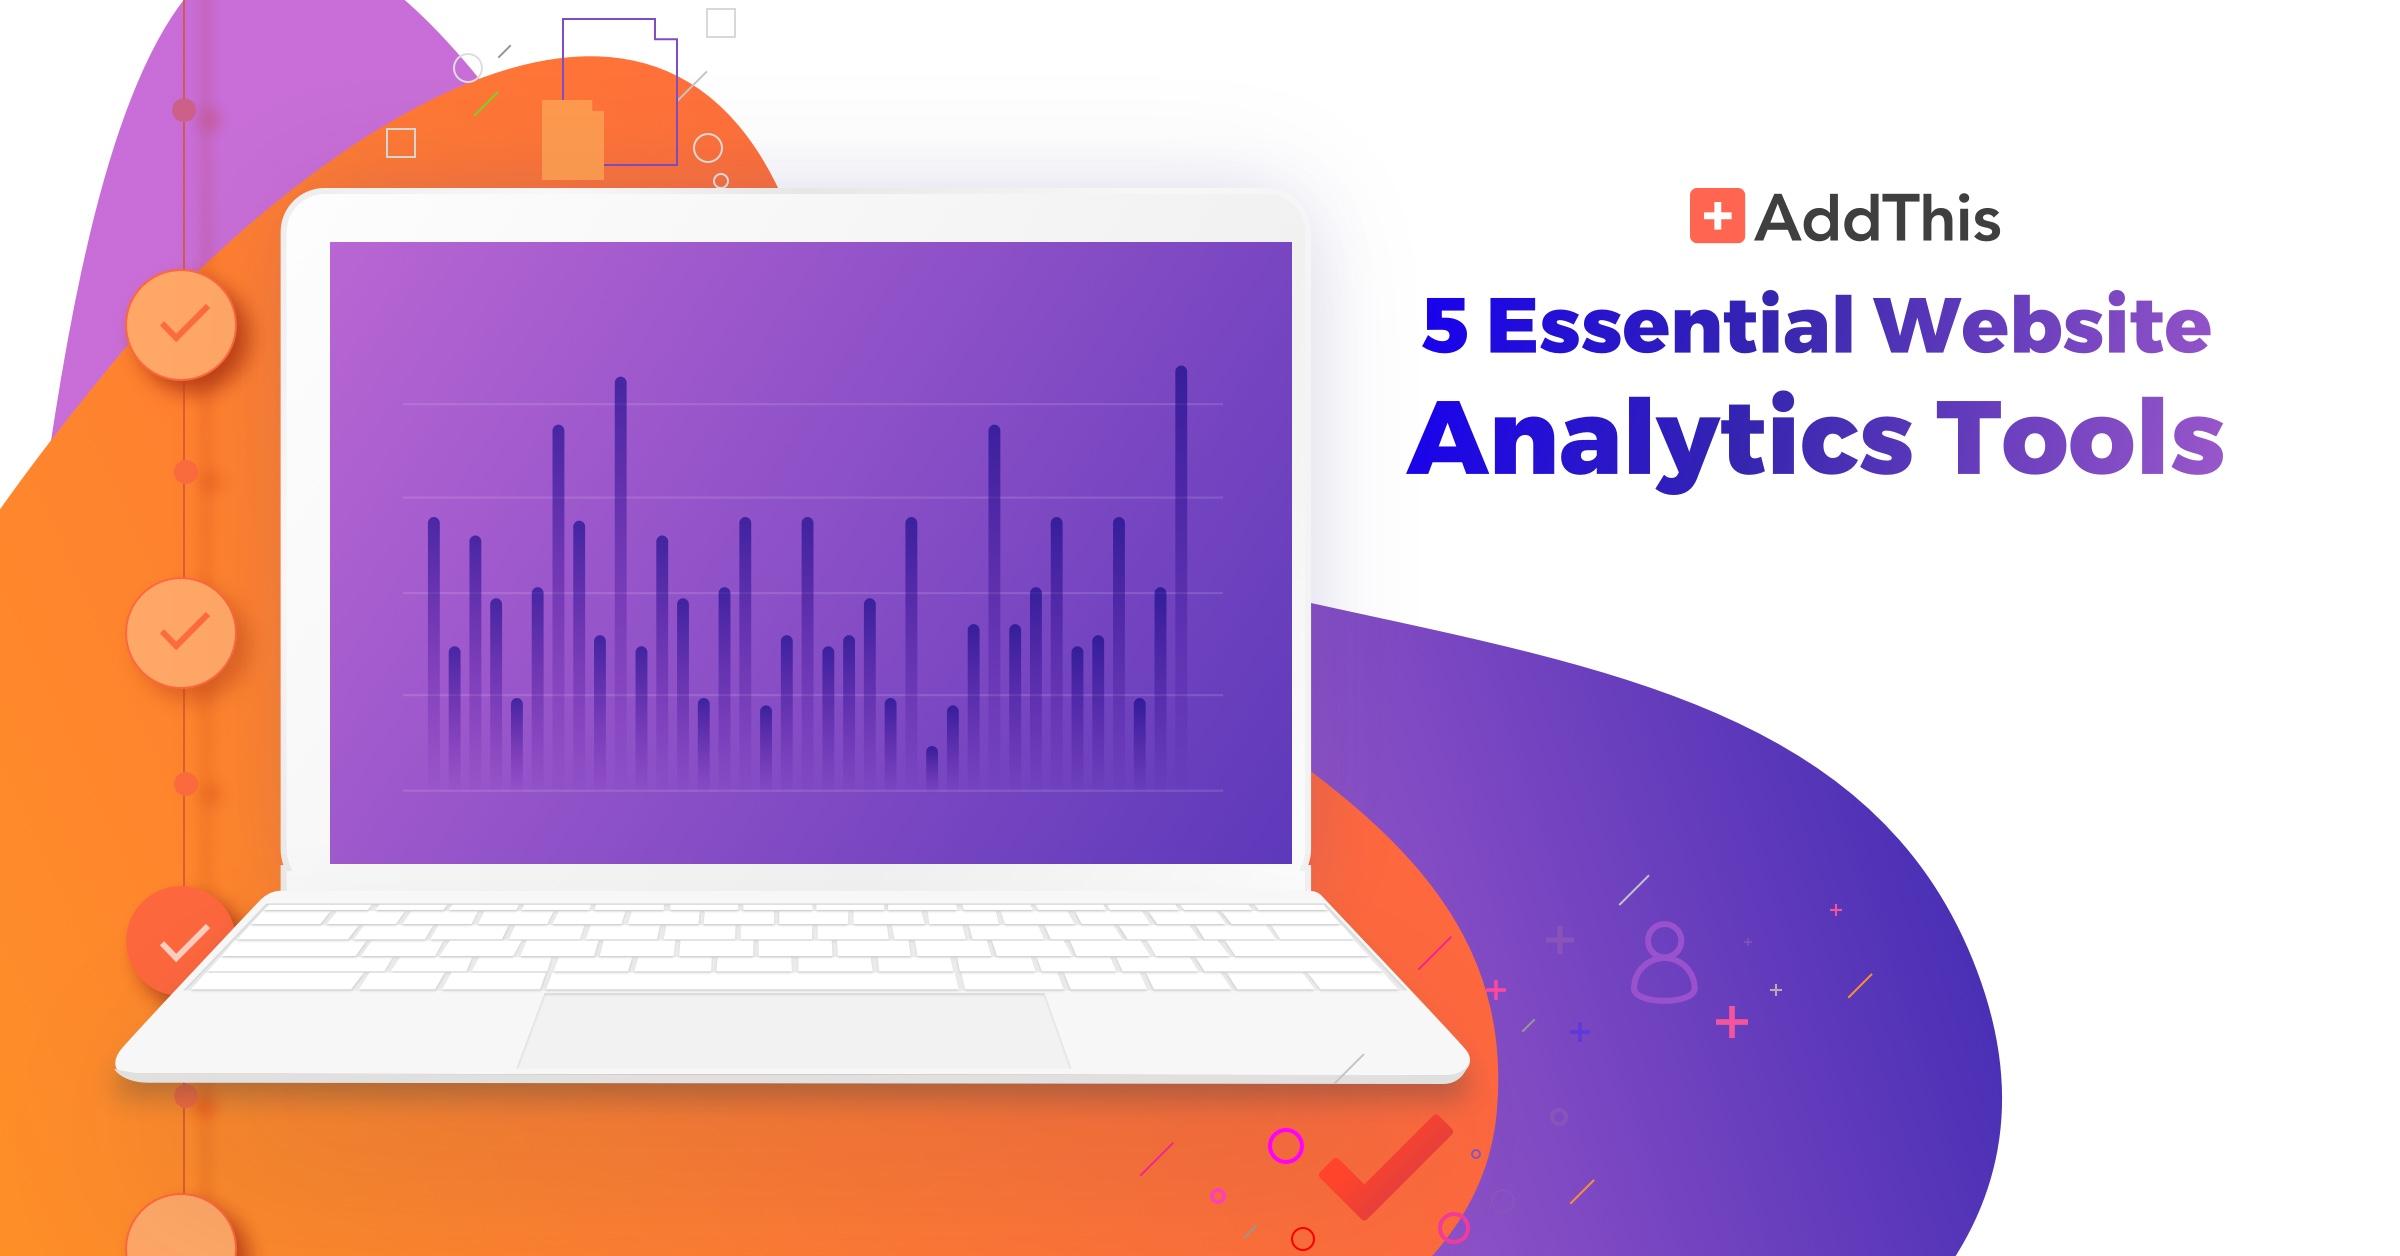 Five Essential Website Analytics Tools